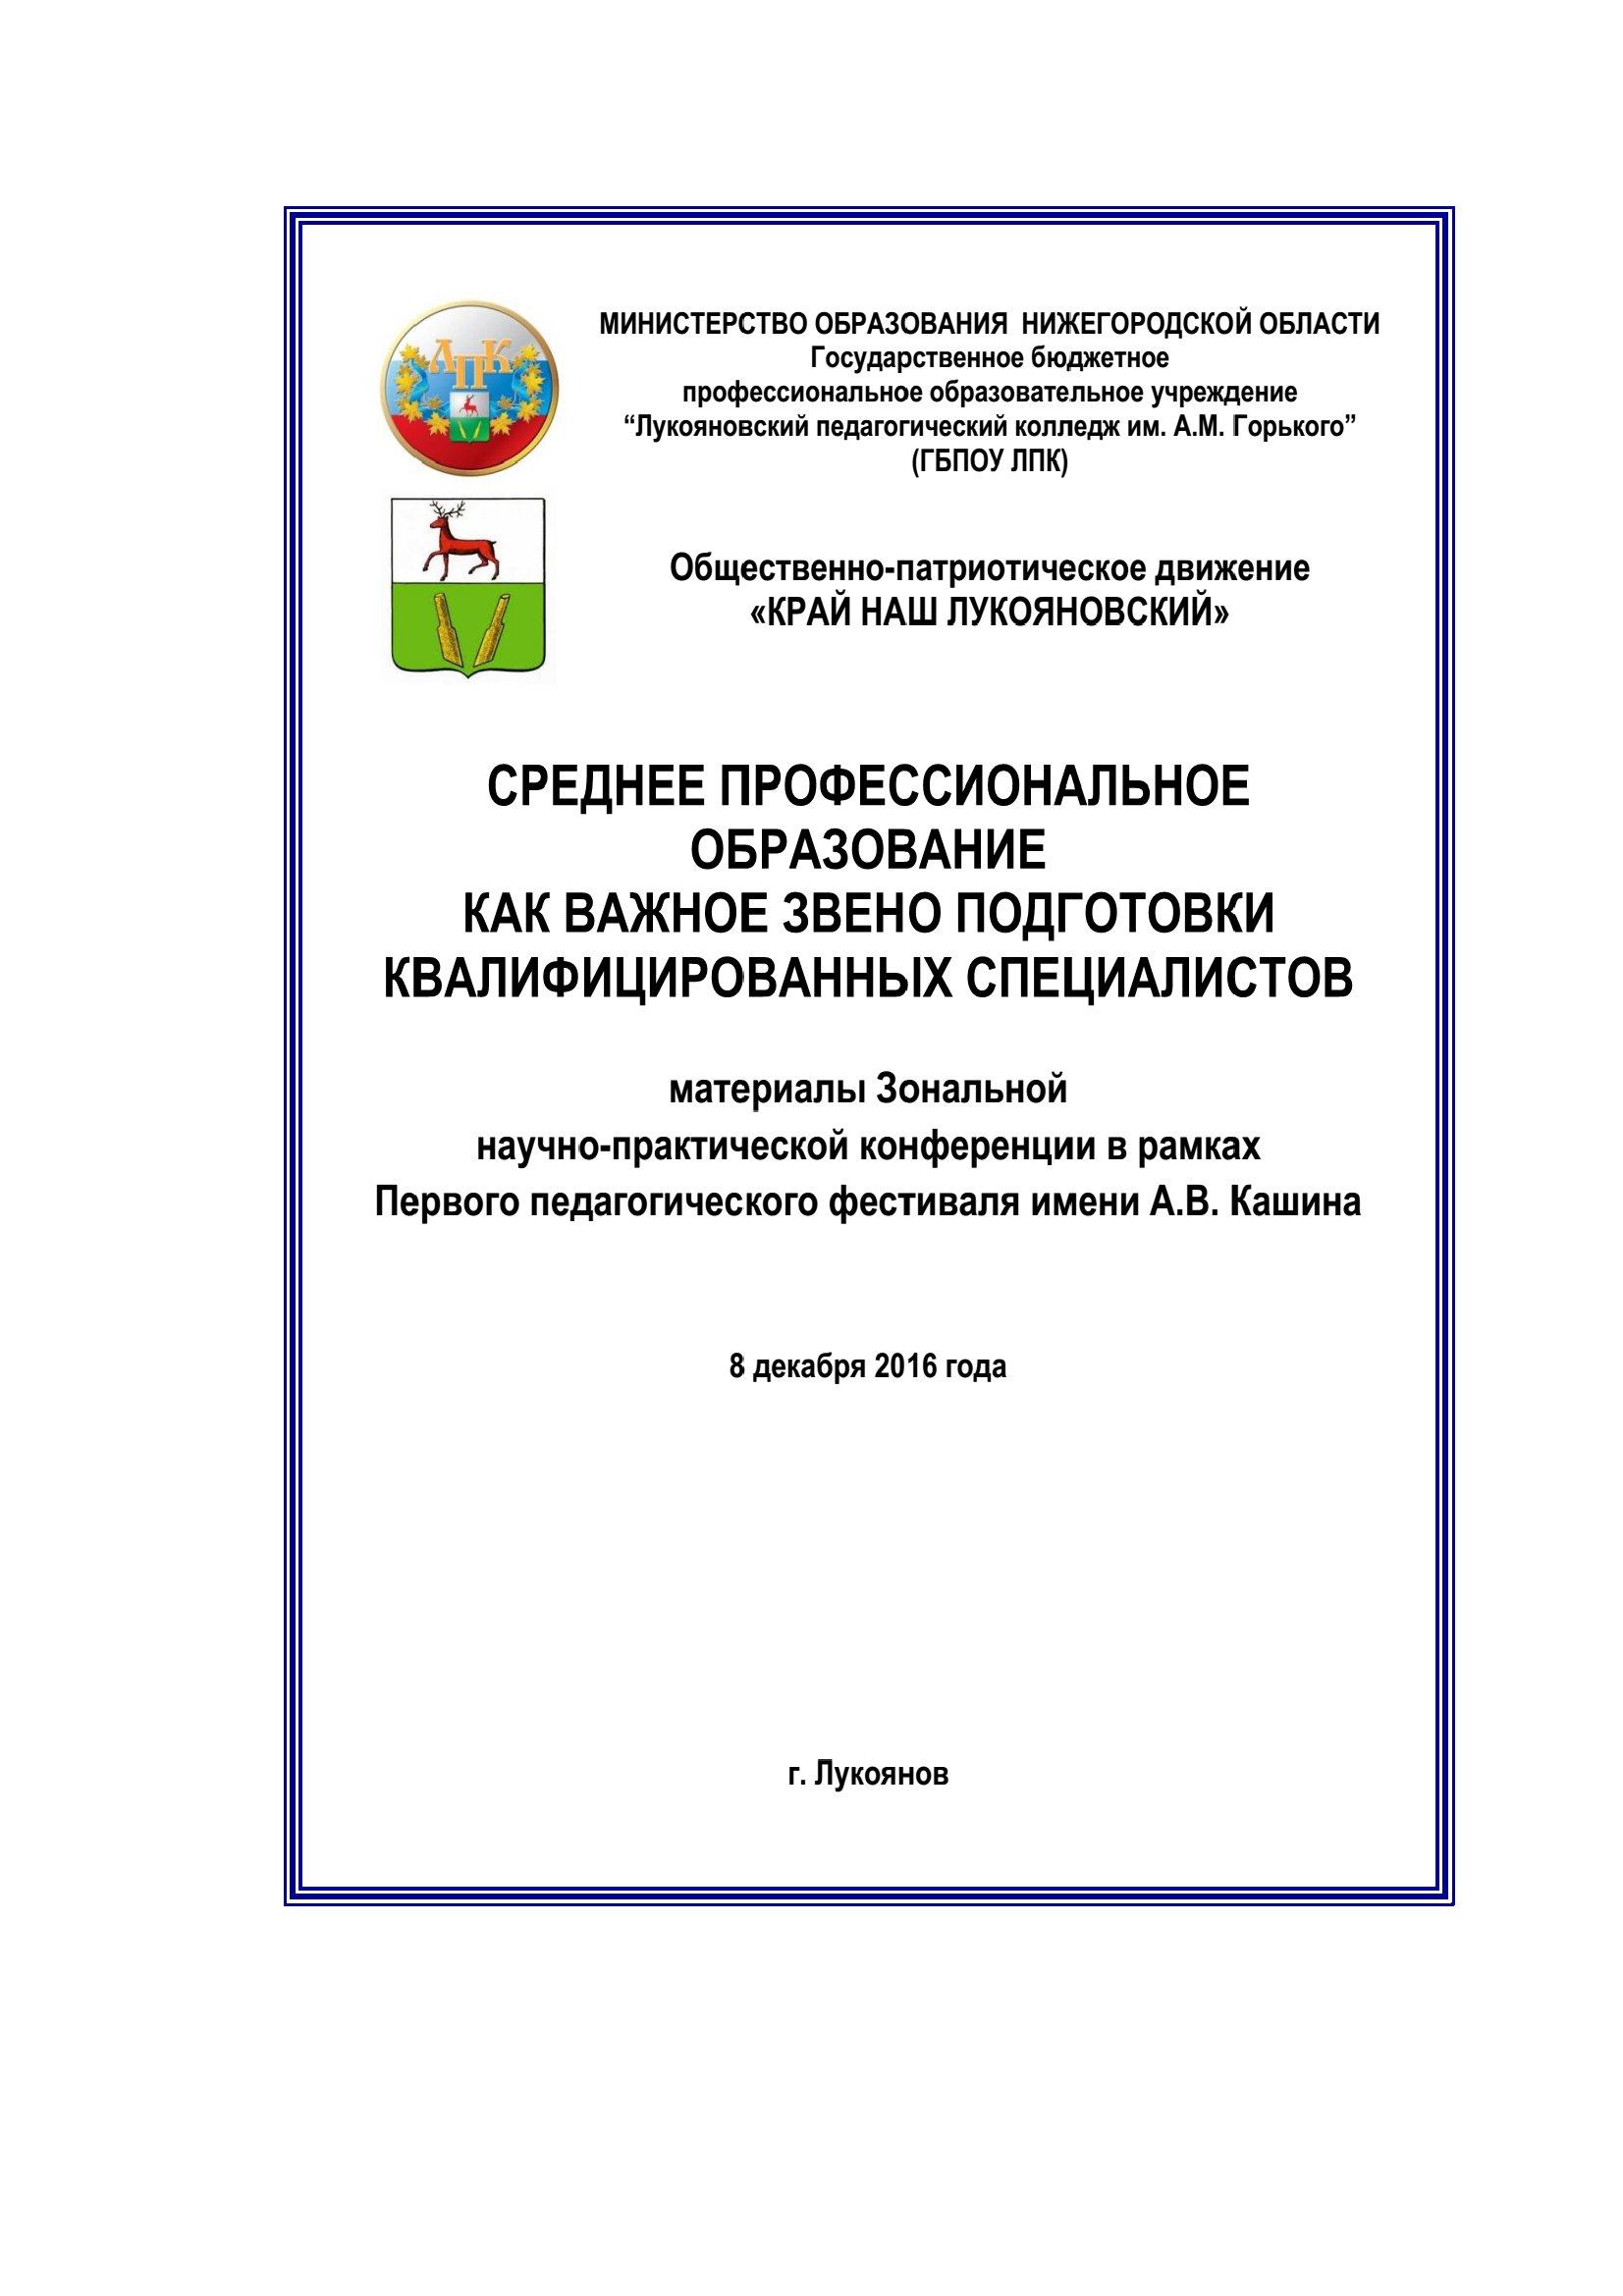 http://kulemina.ucoz.site/sbornik.jpg